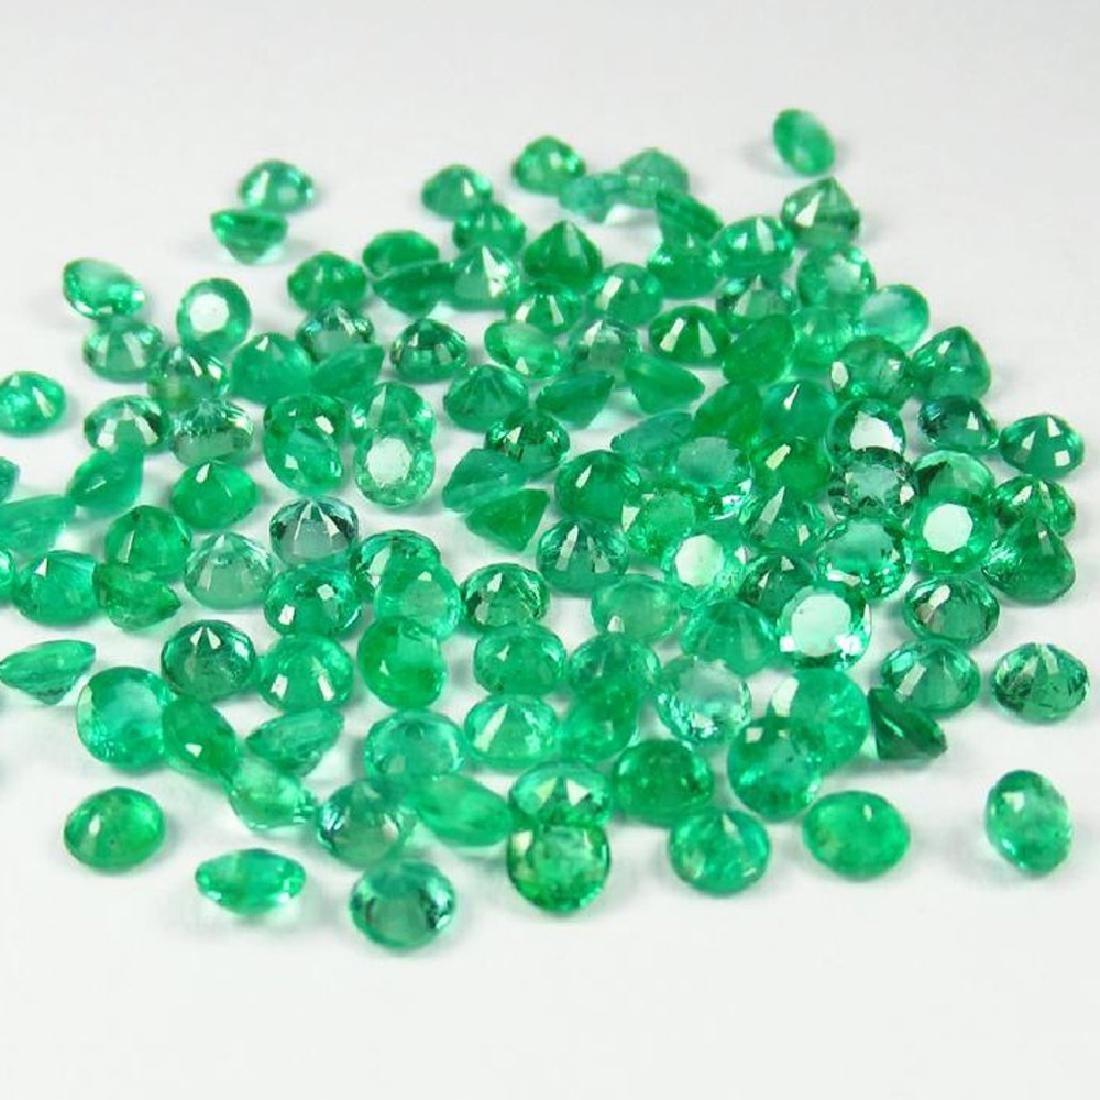 9.67 Ctw Natural 110 Calibrate Emerald 3.0 mm Round - 3